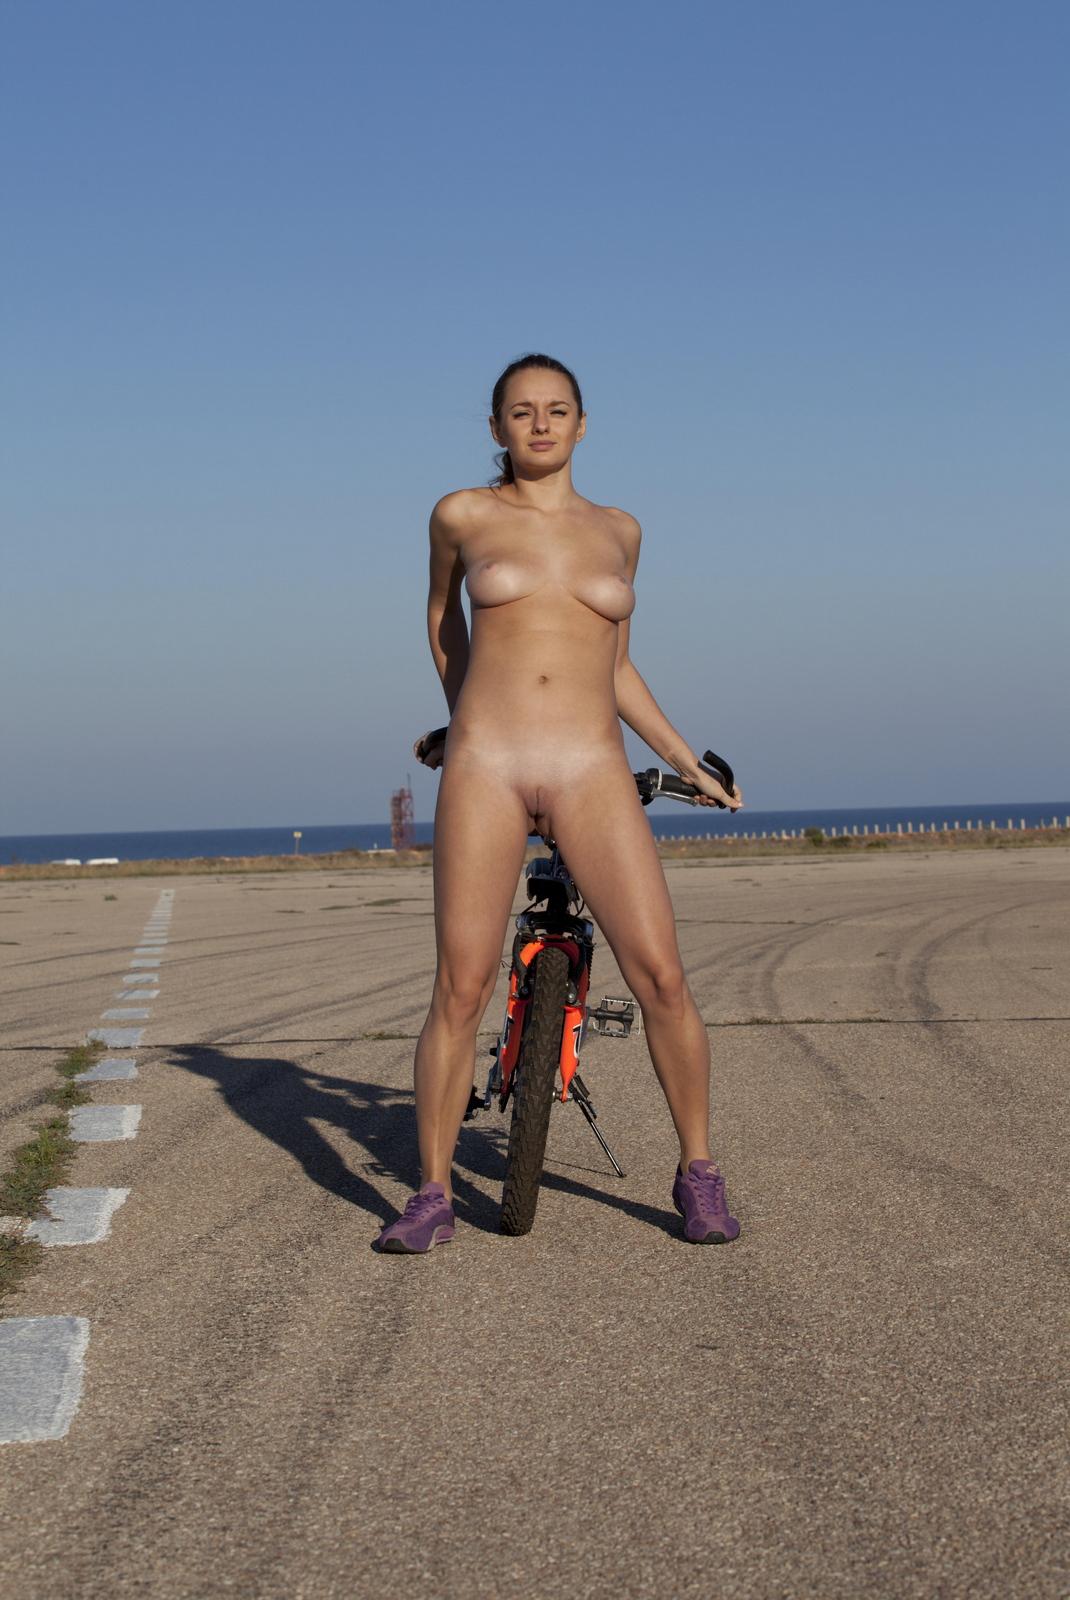 mishel-c-bicycle-boobs-naked-domai-13